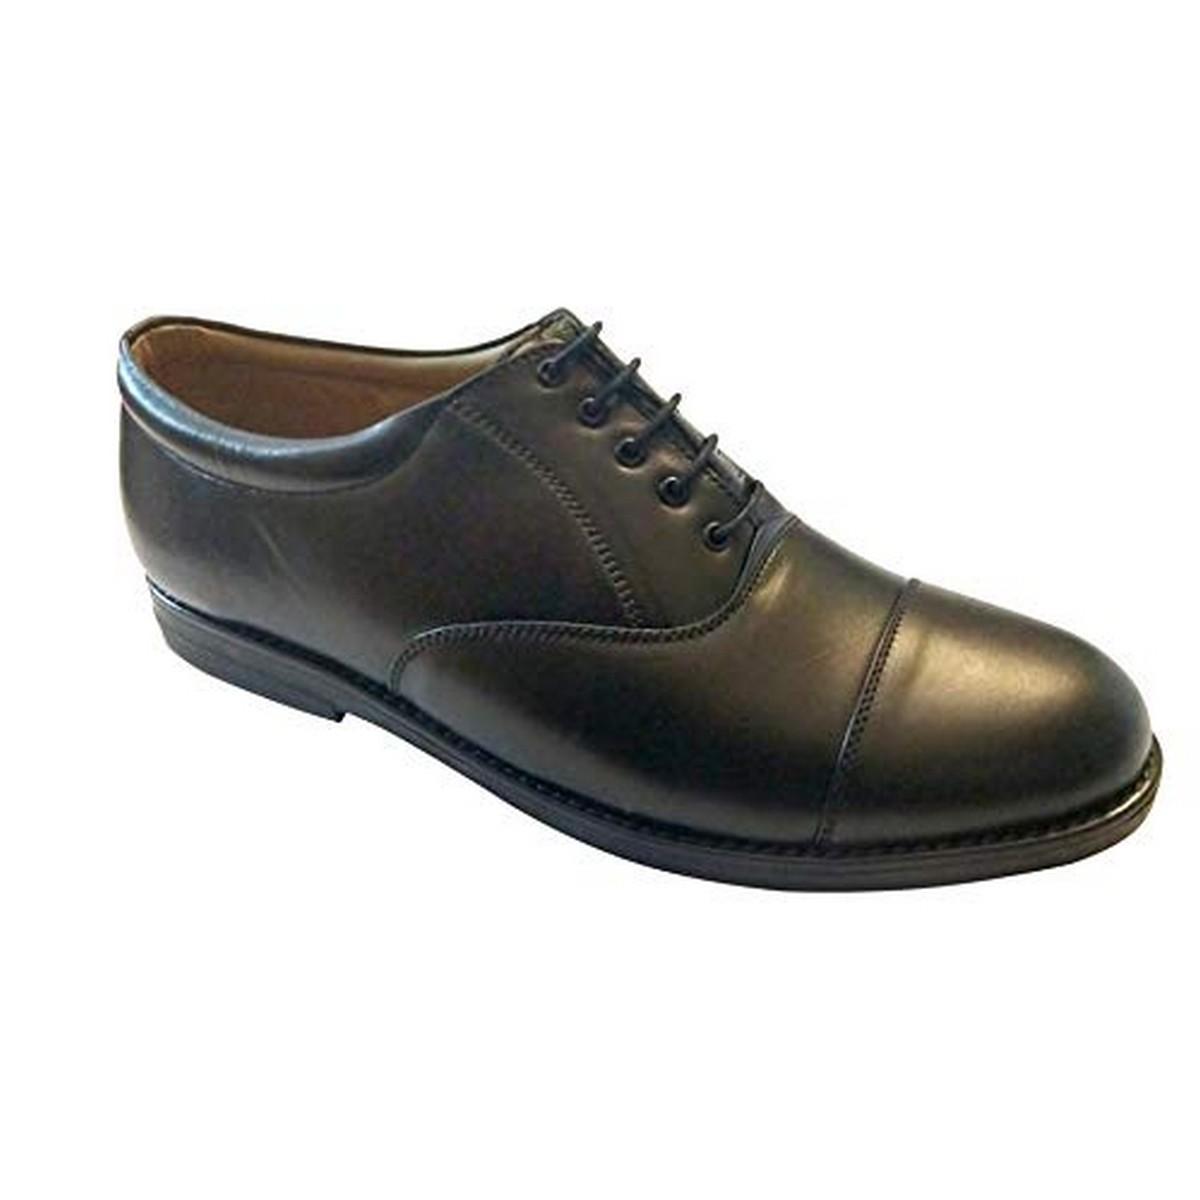 Men's Handmade Leather Oxford Pattern Black Shoes